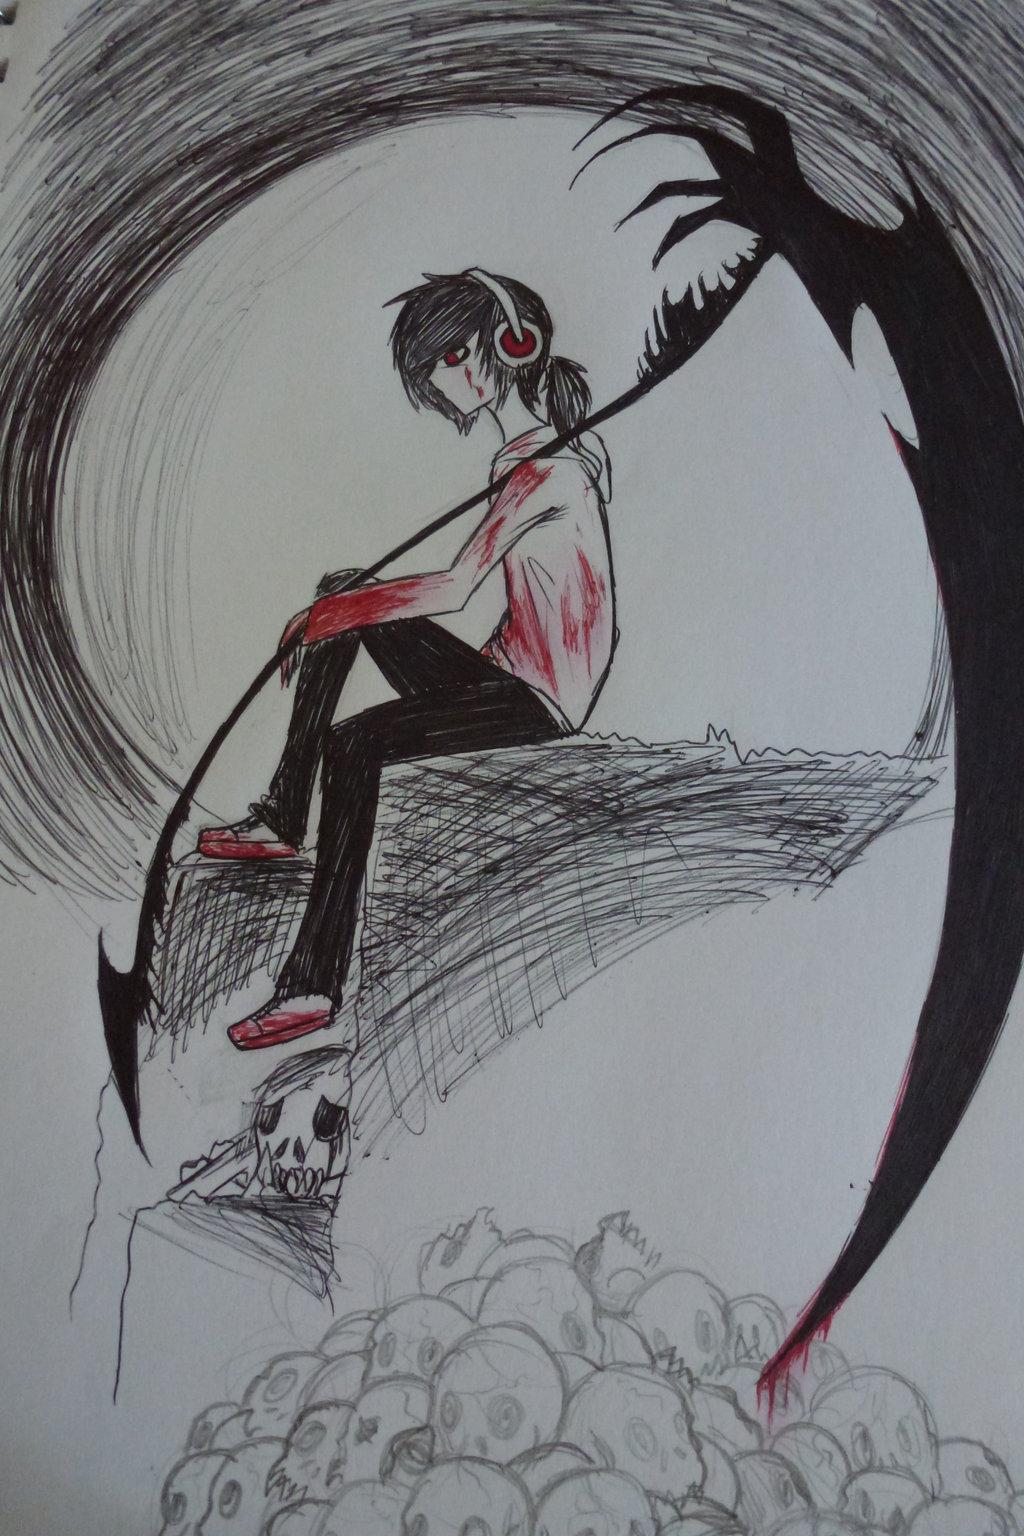 Drawn scythe blood Scythe Your by Puppet Black